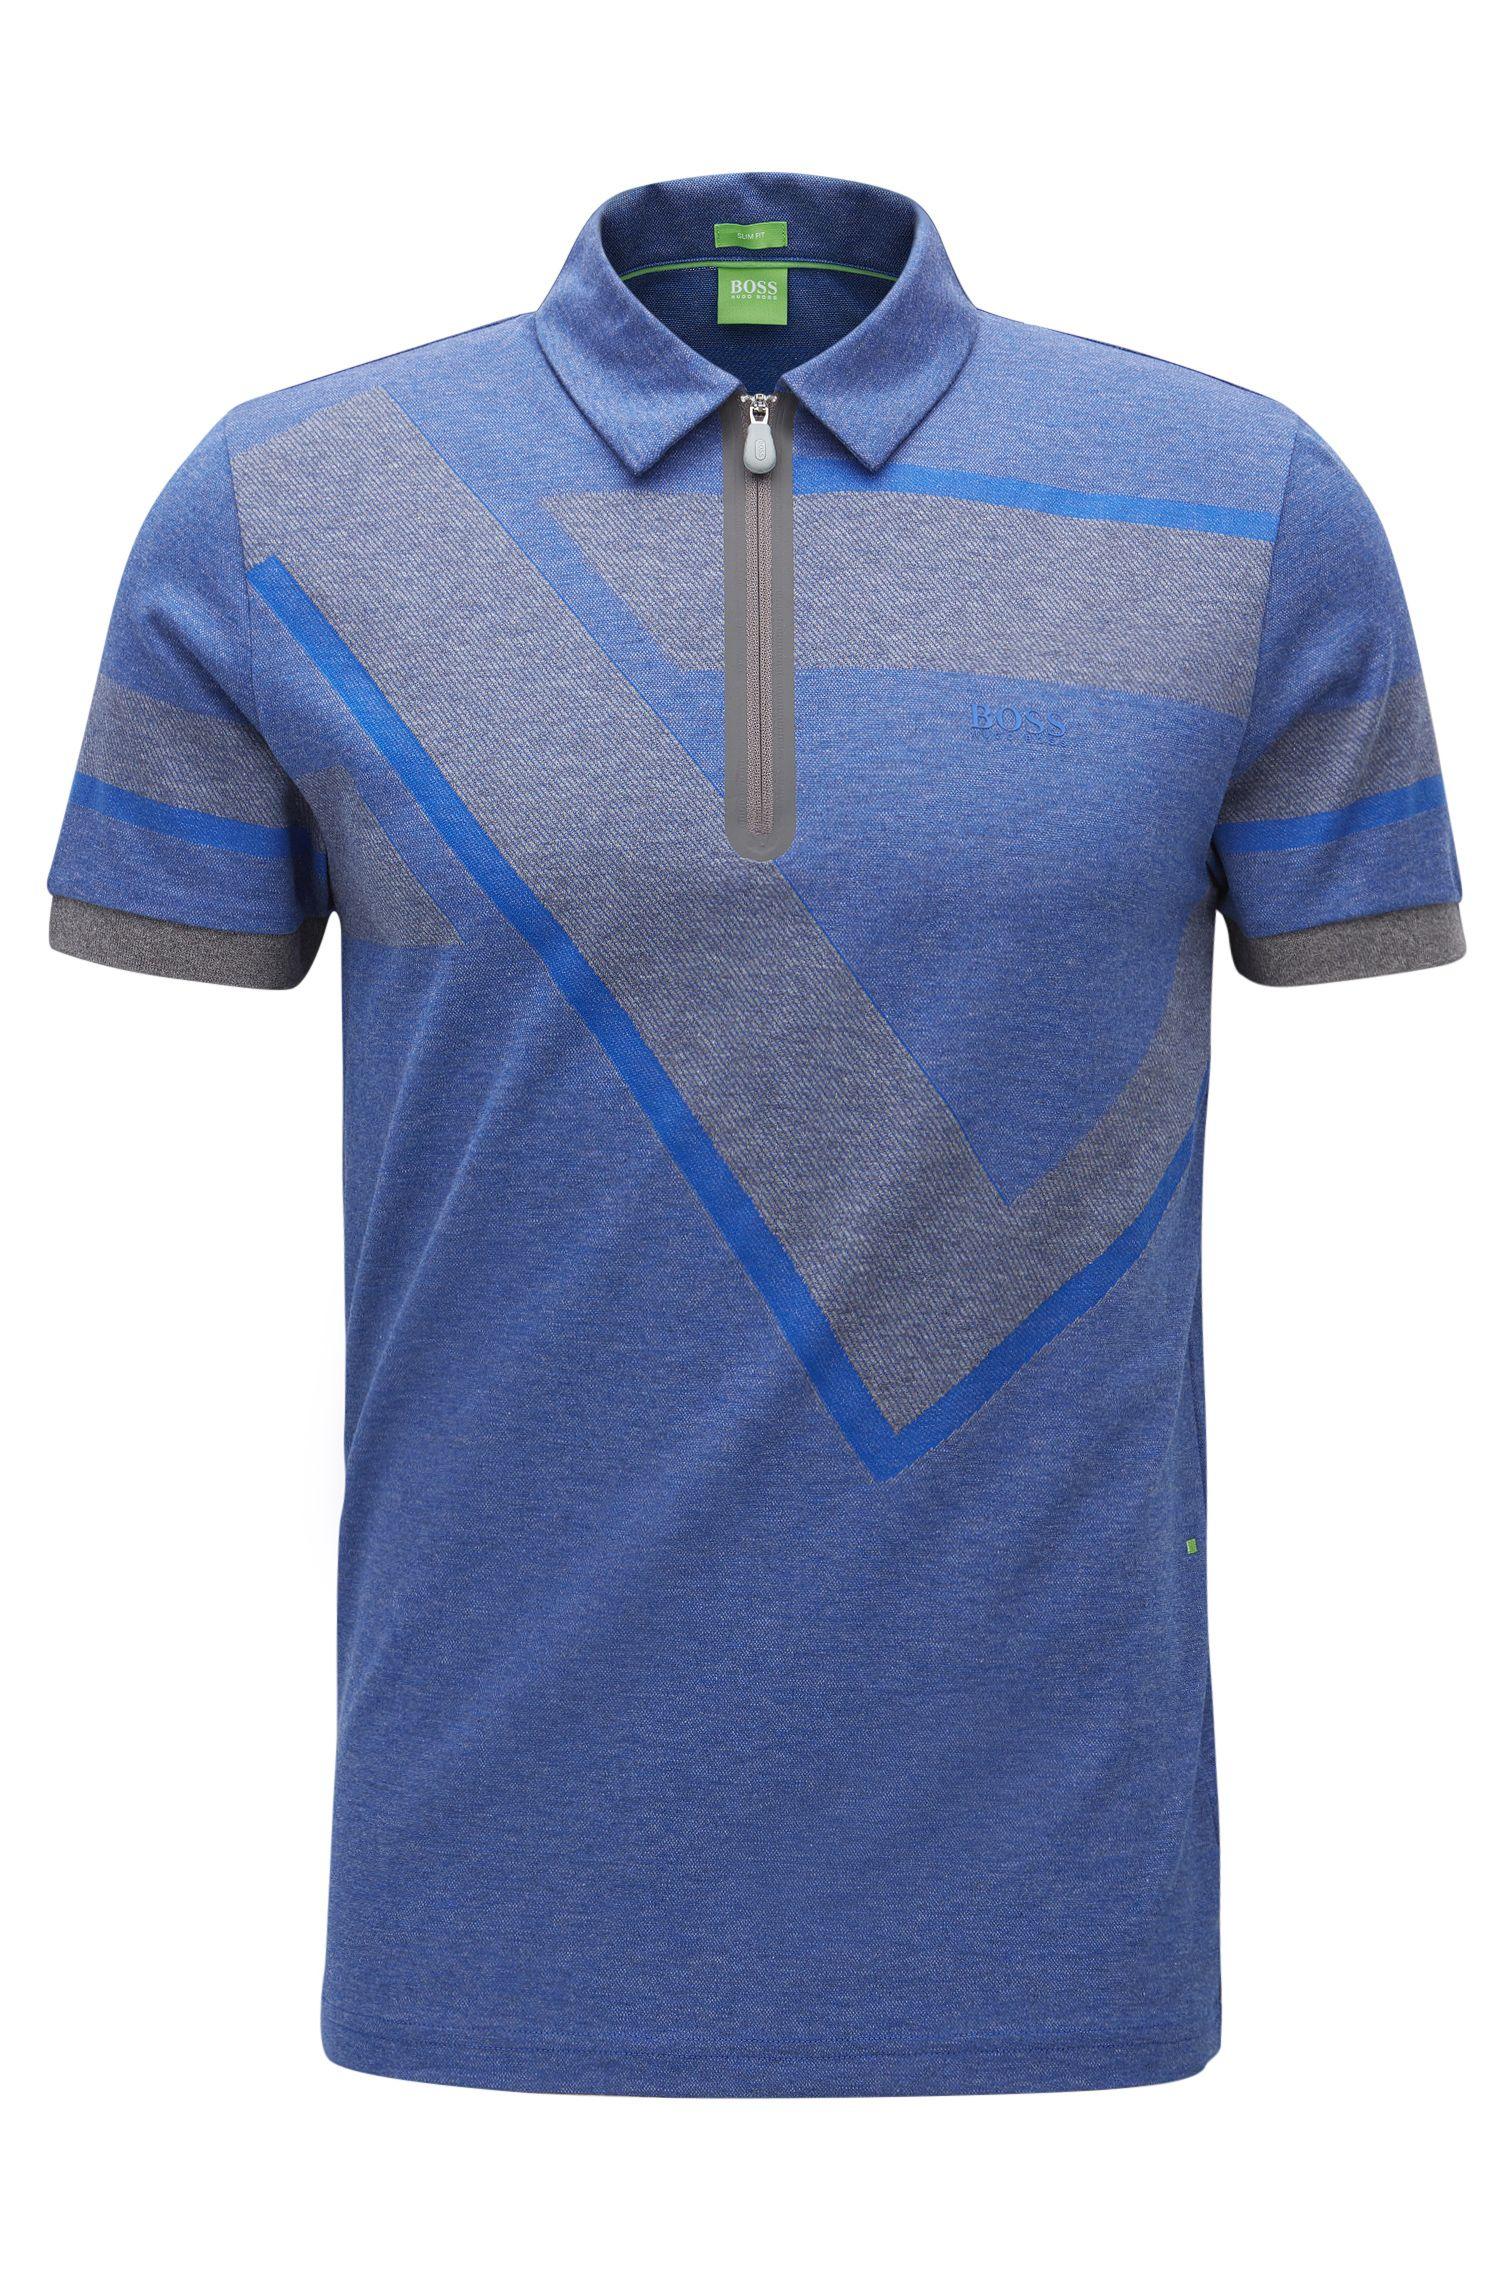 Geo-Print Cotton Polo Shirt, Slim Fit | Pariq, Grey